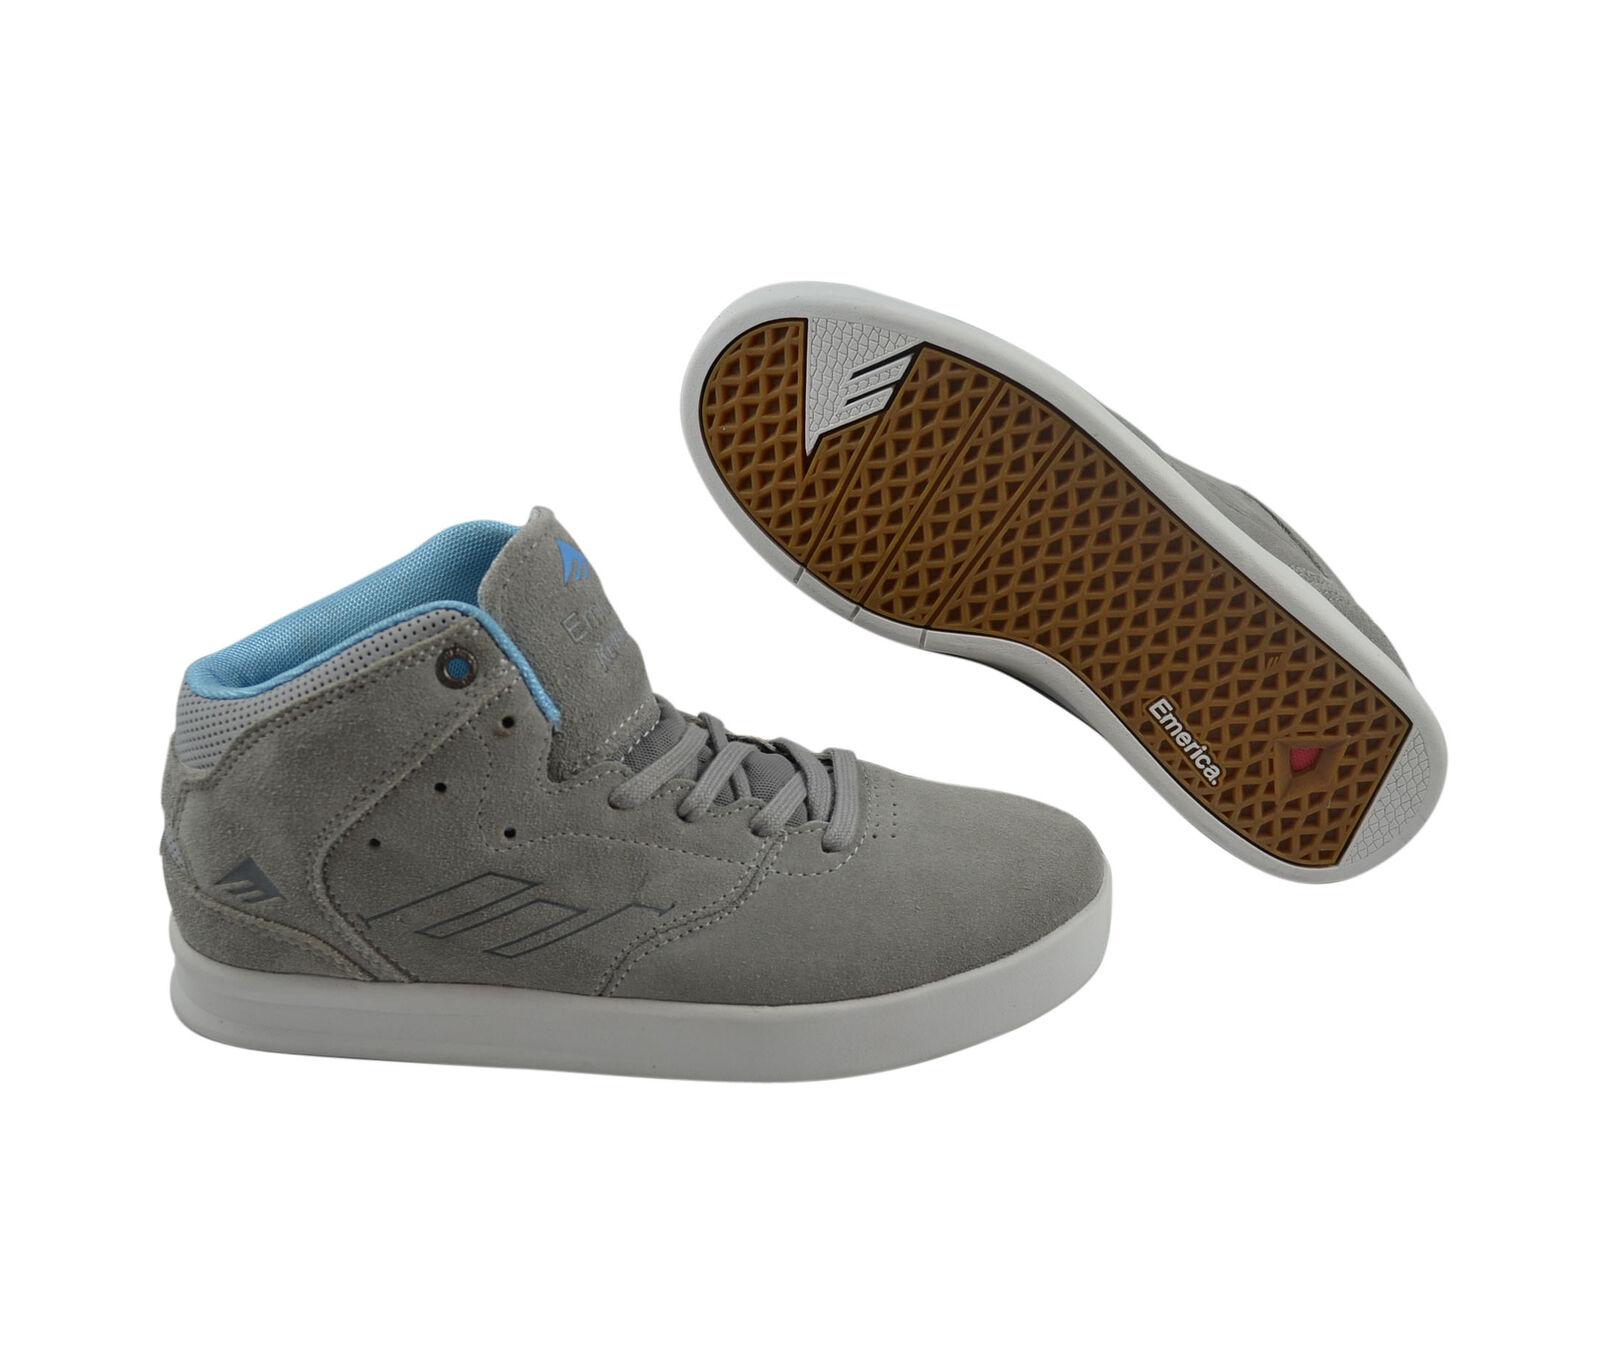 Emerica The Reynolds Grau/Blau Skater Turnschuhe/Schuhe grau